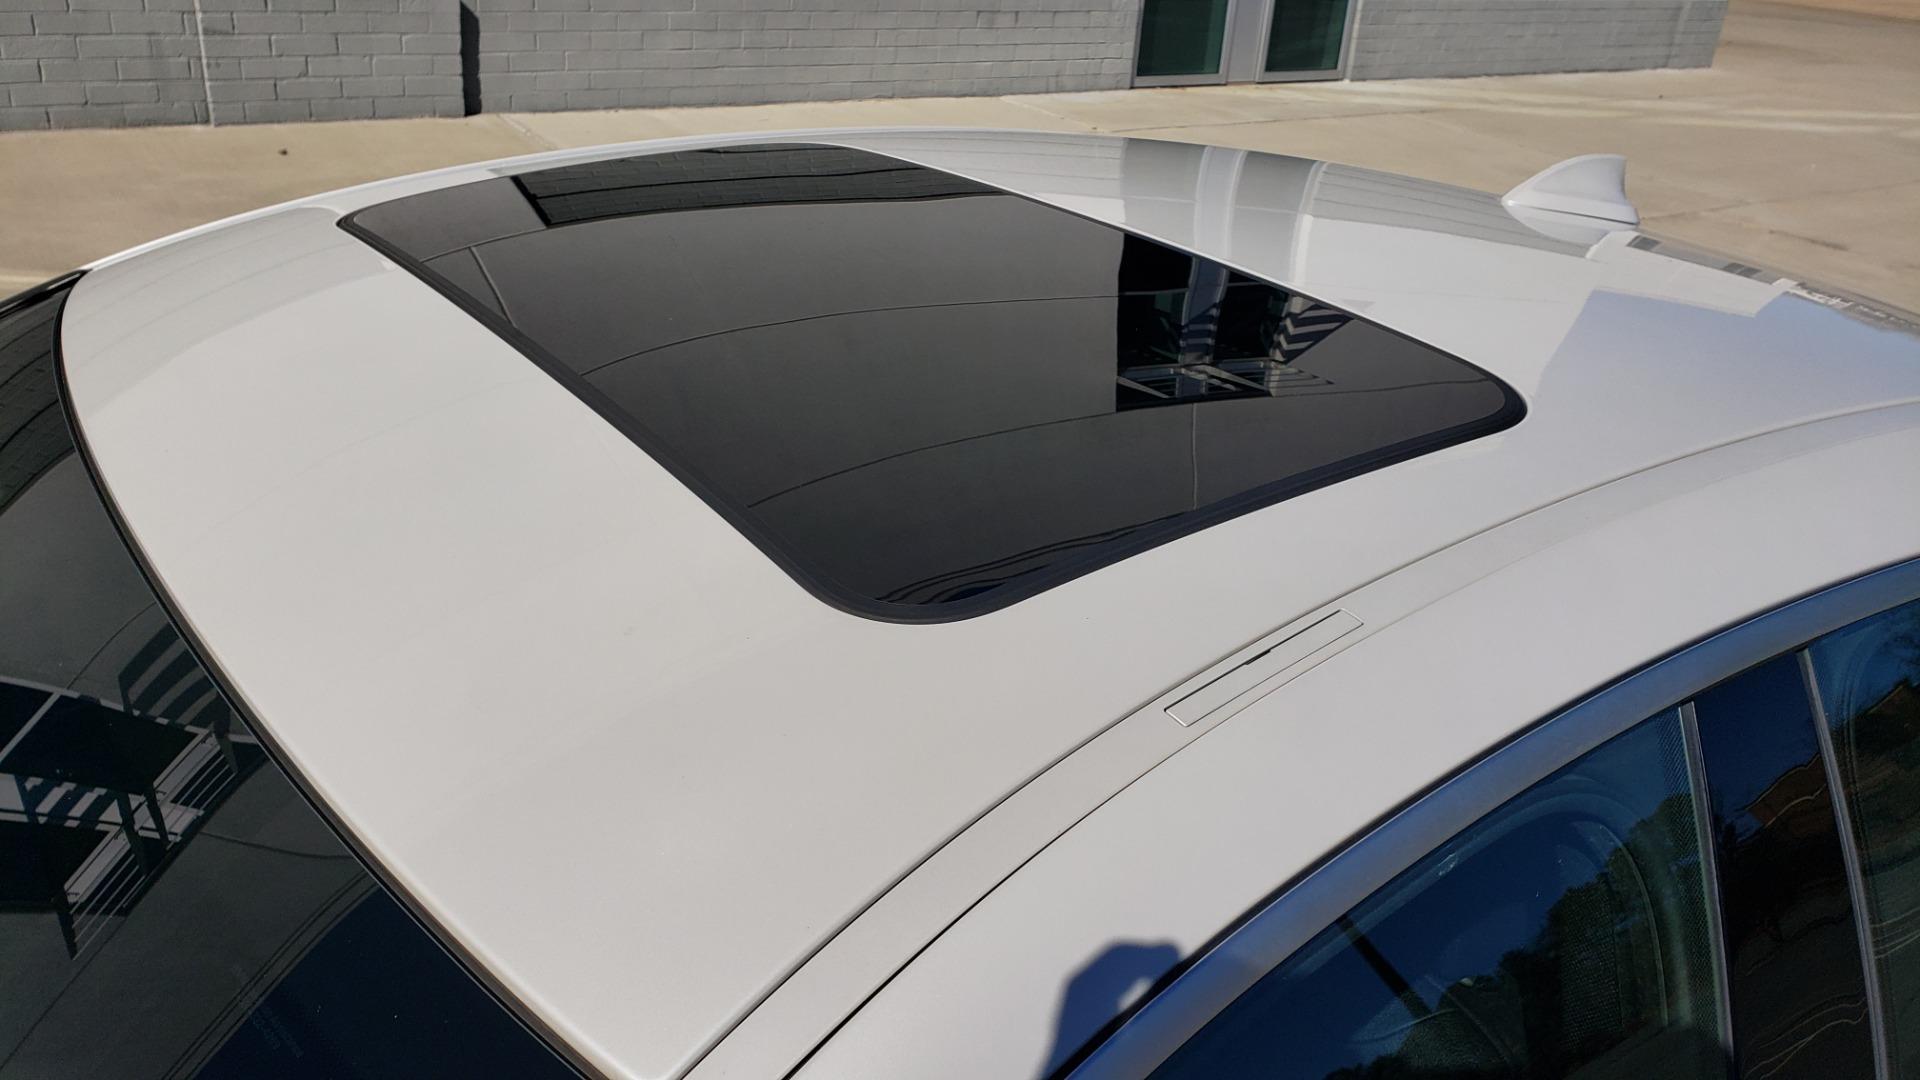 Used 2018 BMW 4 SERIES 430IXDRIVE / PREMIUM / NAV / SUNROOF / ESSENTIALS PKG for sale $27,795 at Formula Imports in Charlotte NC 28227 9